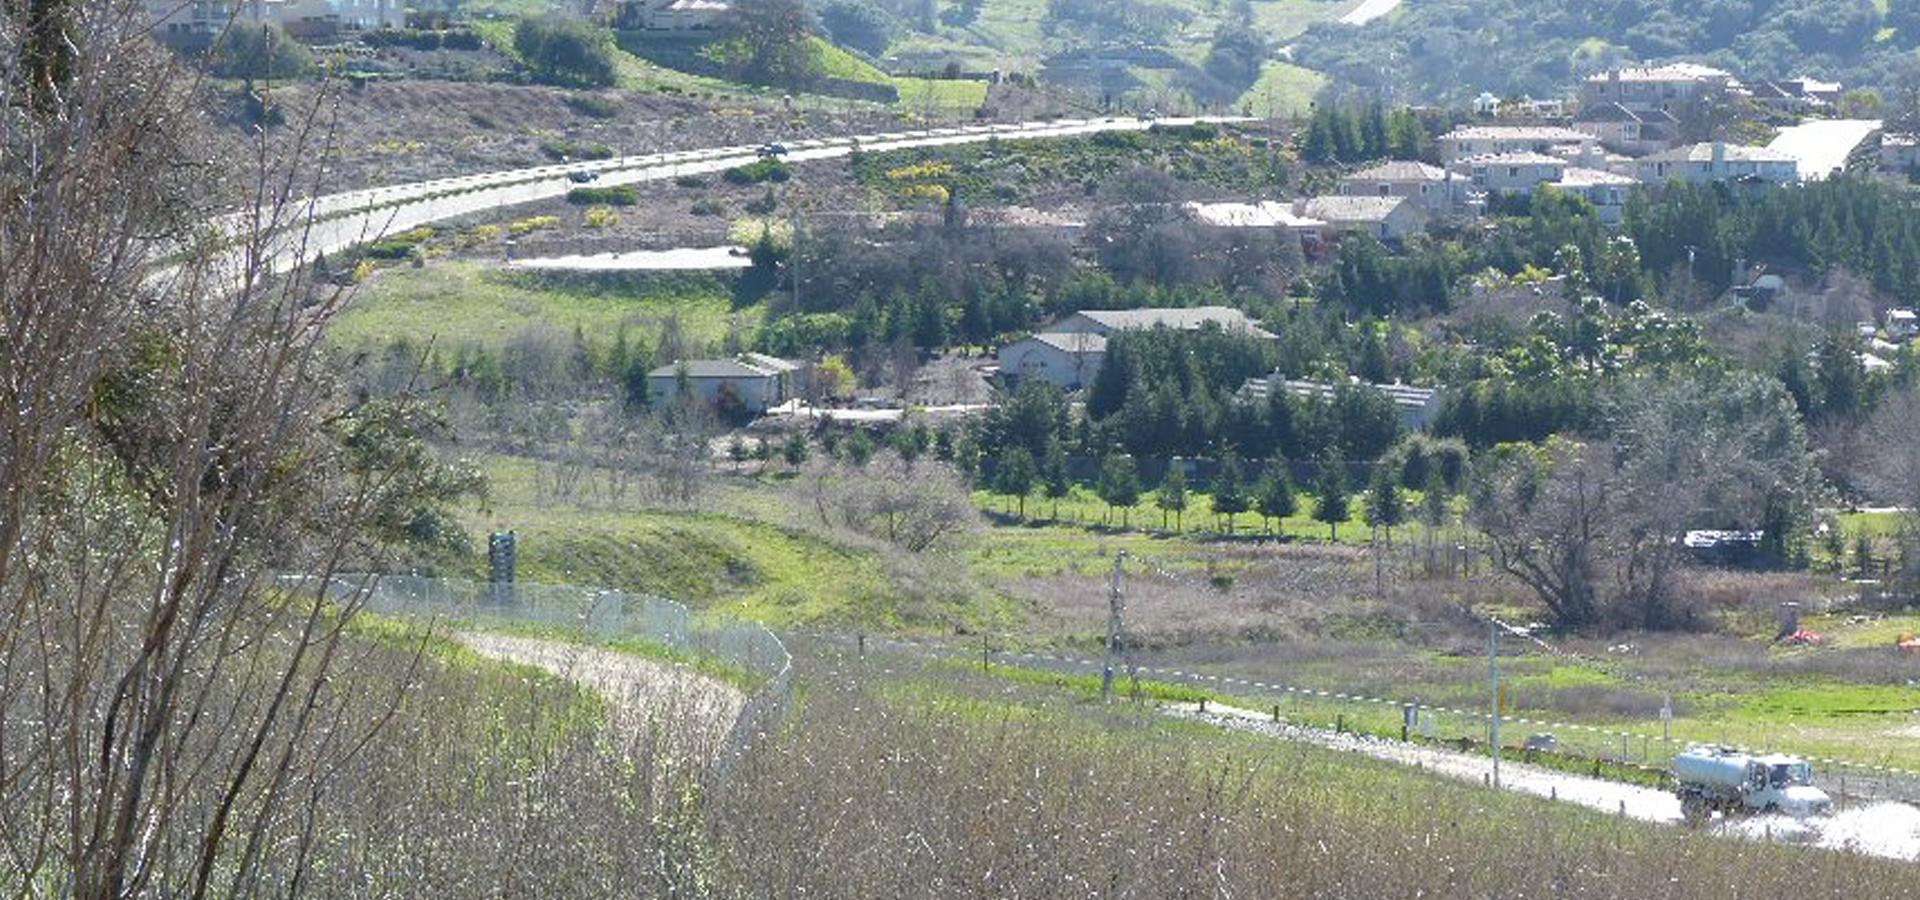 El Dorado Hills, California, USA